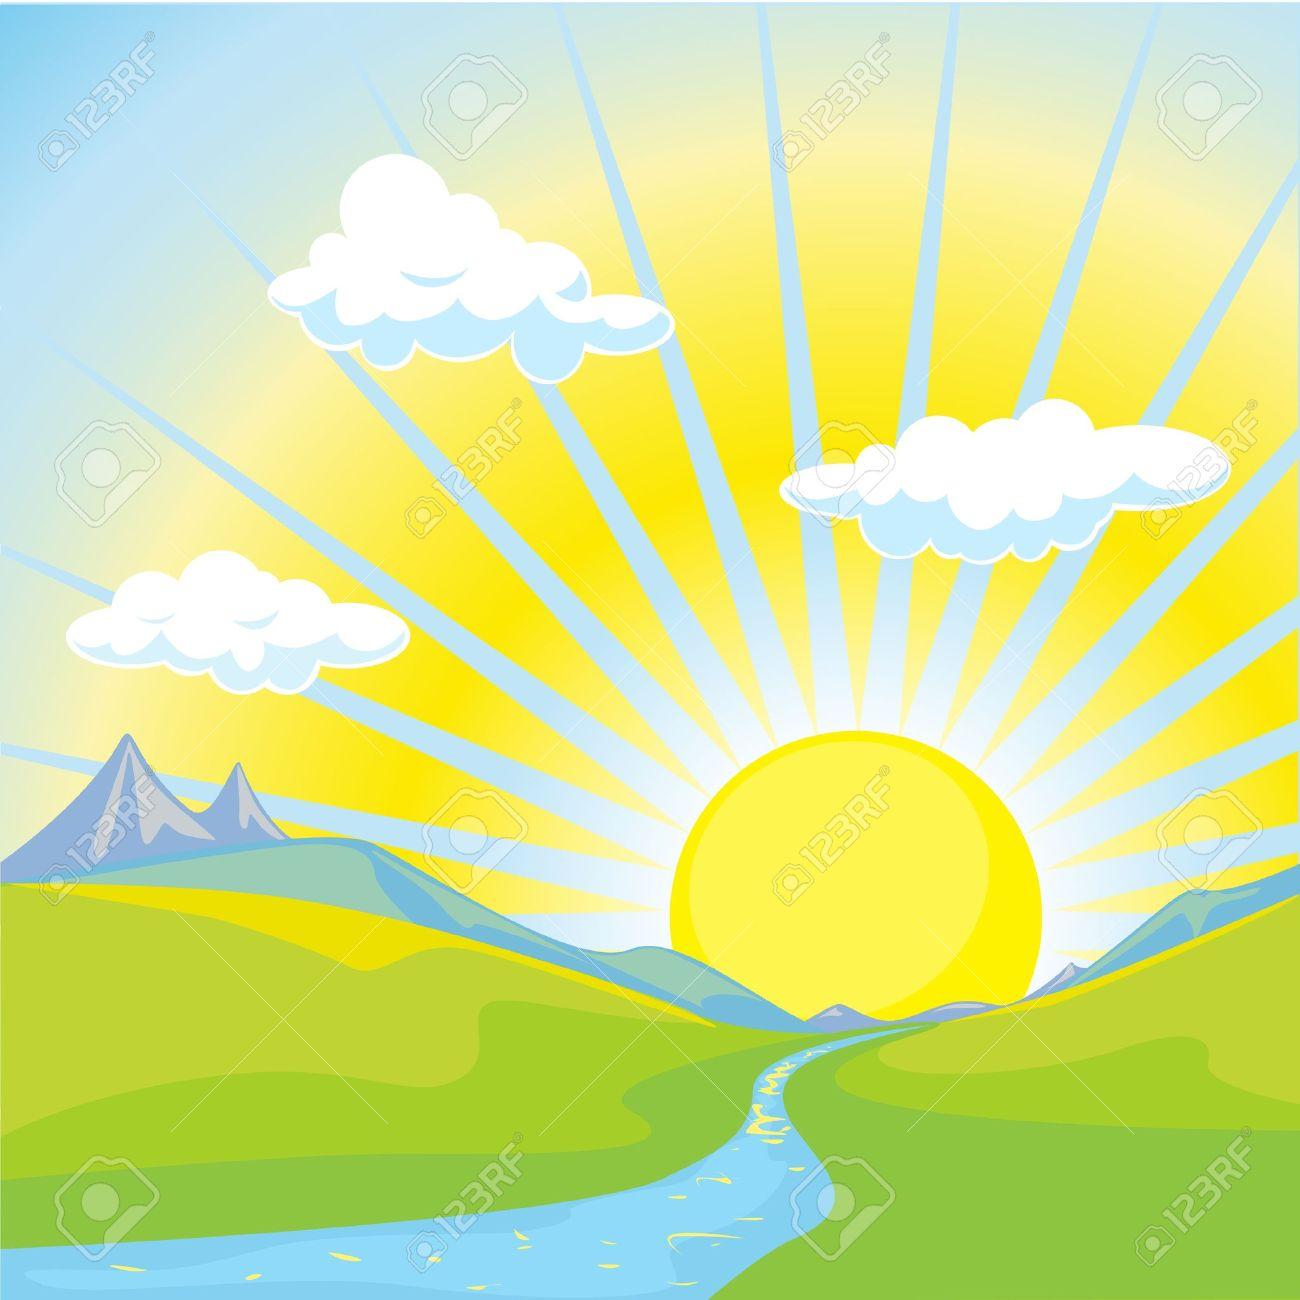 Free Sunrise Clipart Image - Sunrise Clipart